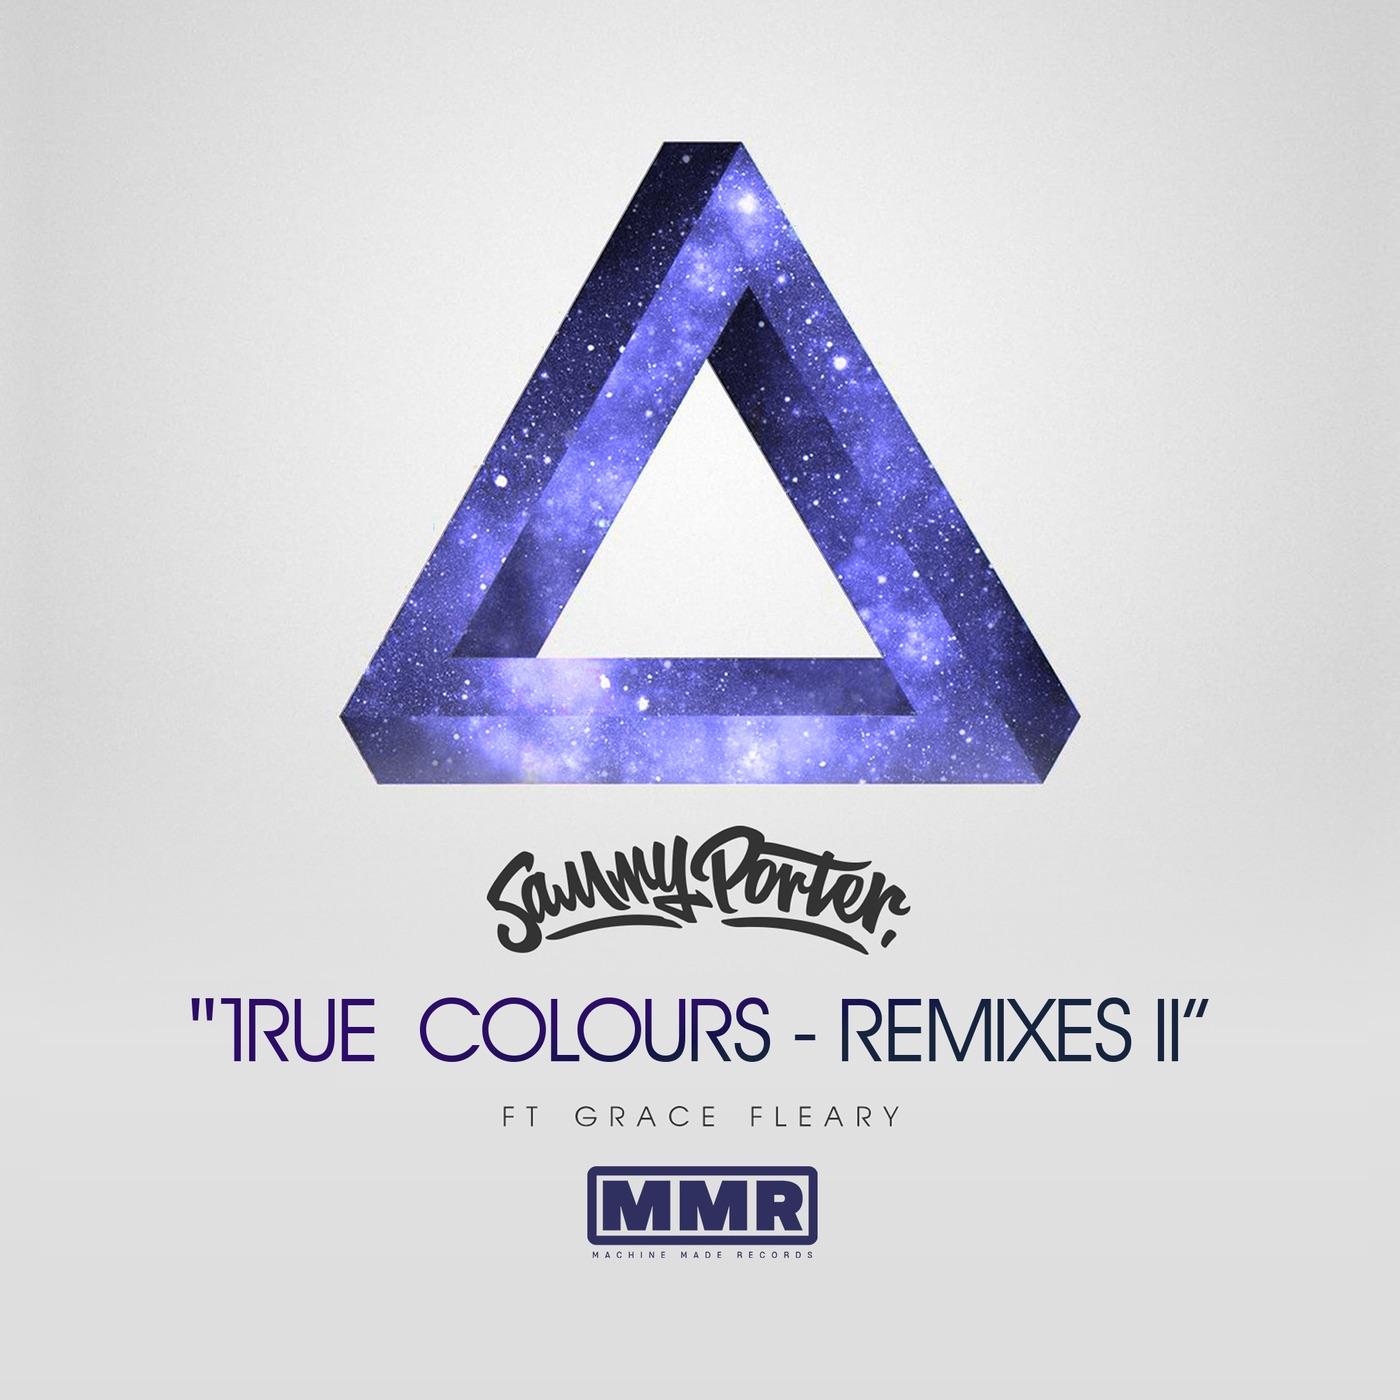 True Colours (Remixes II) [feat. Grace Fleary] - EP